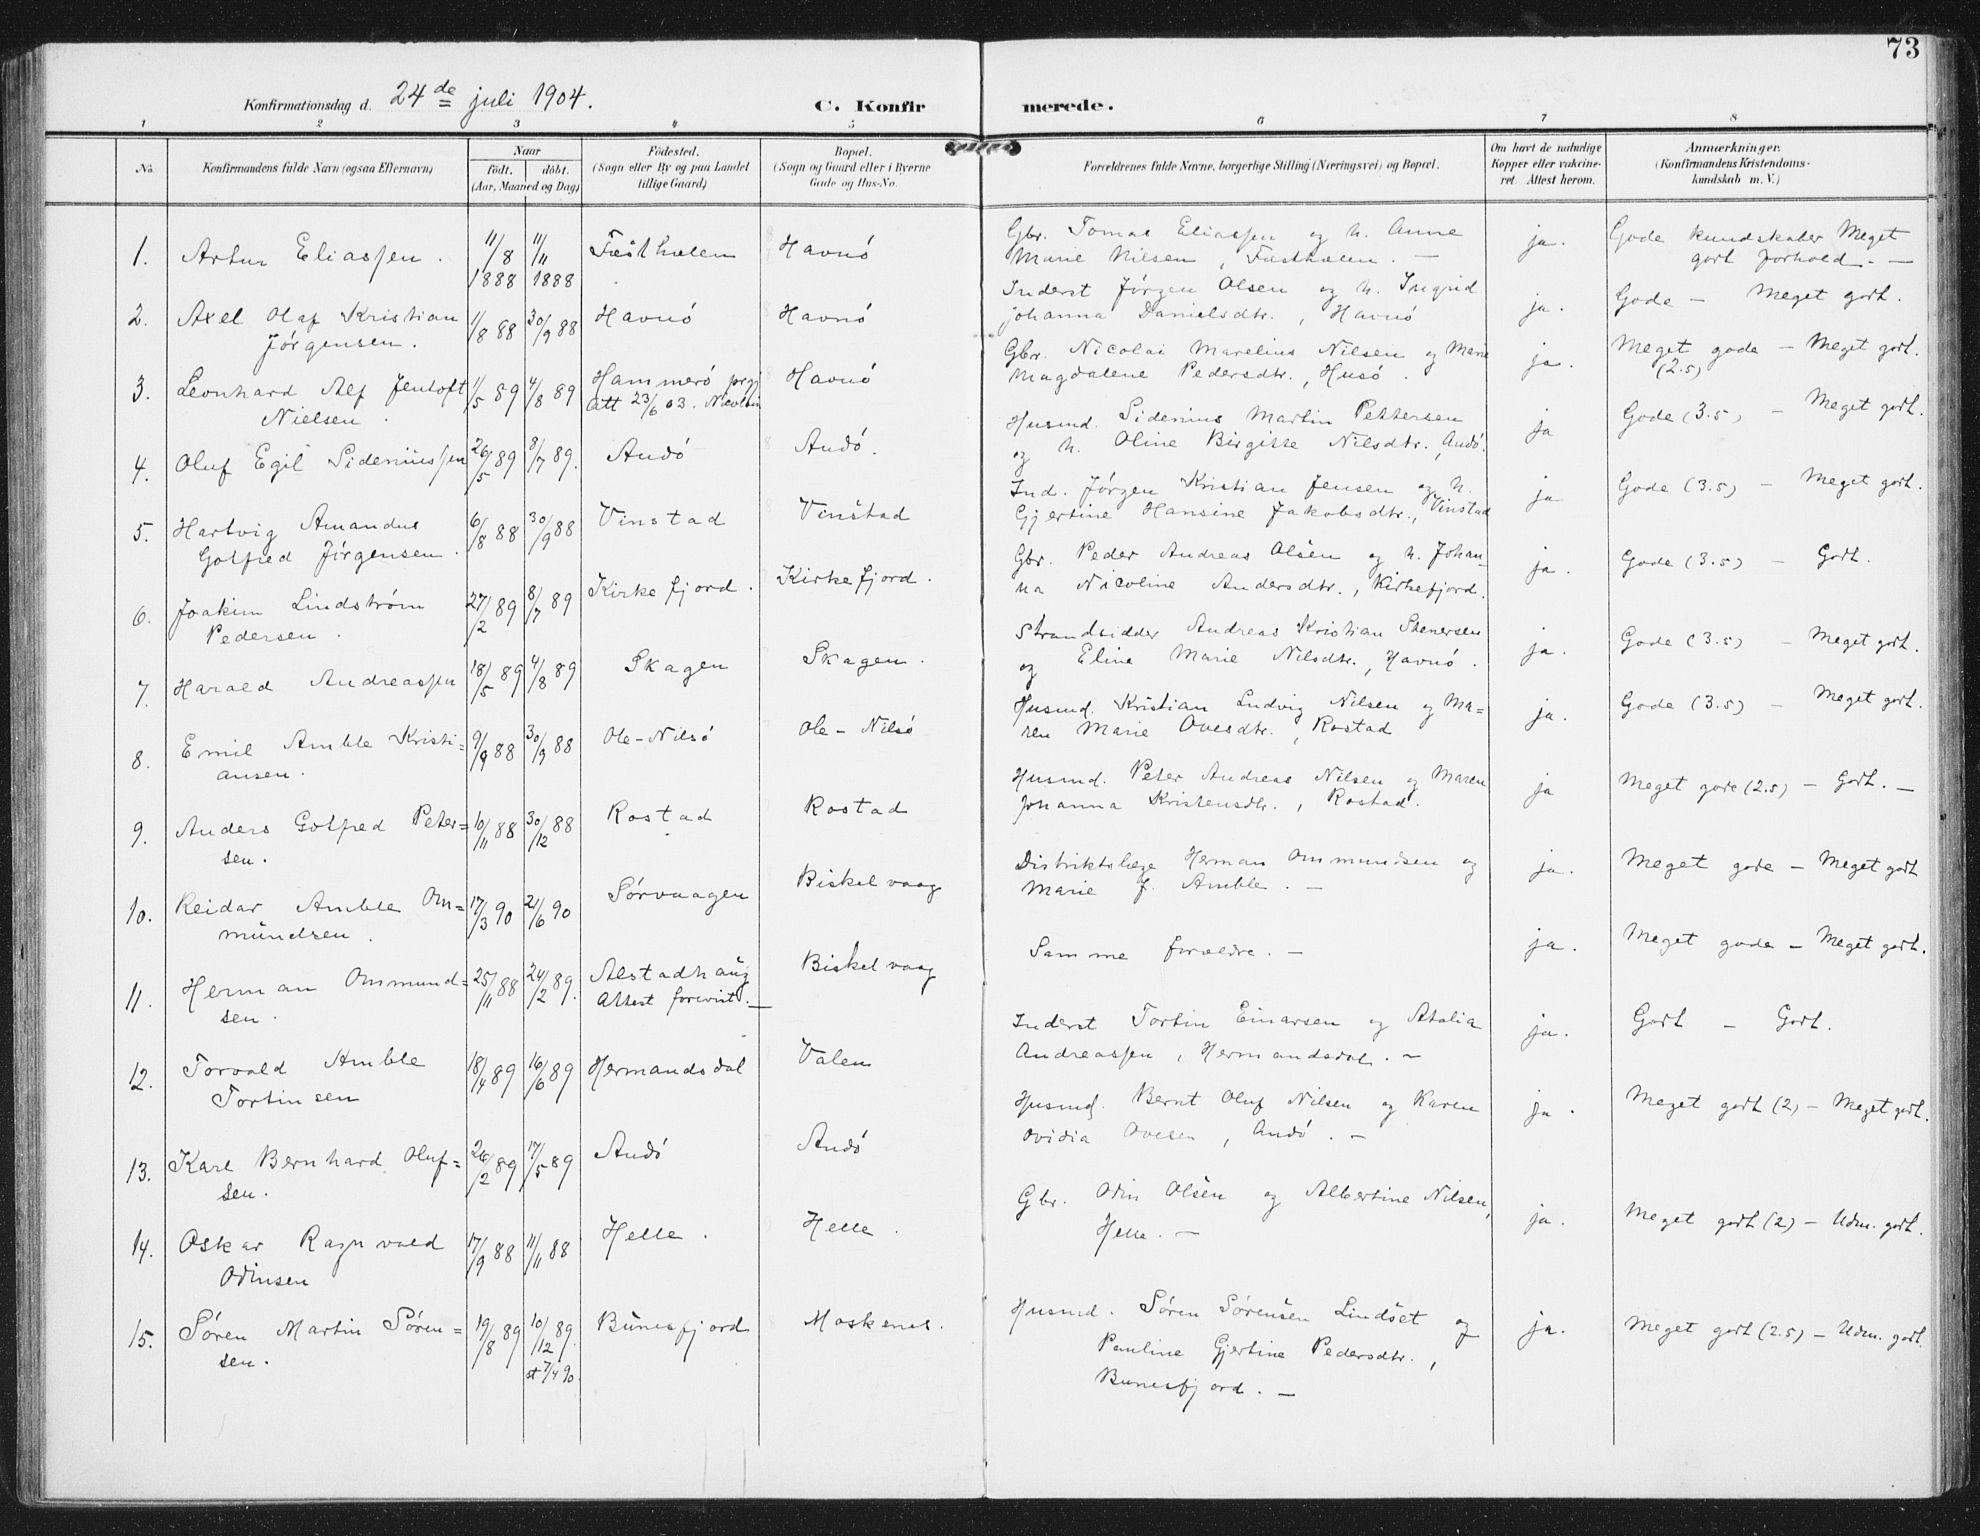 SAT, Ministerialprotokoller, klokkerbøker og fødselsregistre - Nordland, 886/L1221: Ministerialbok nr. 886A03, 1903-1913, s. 73